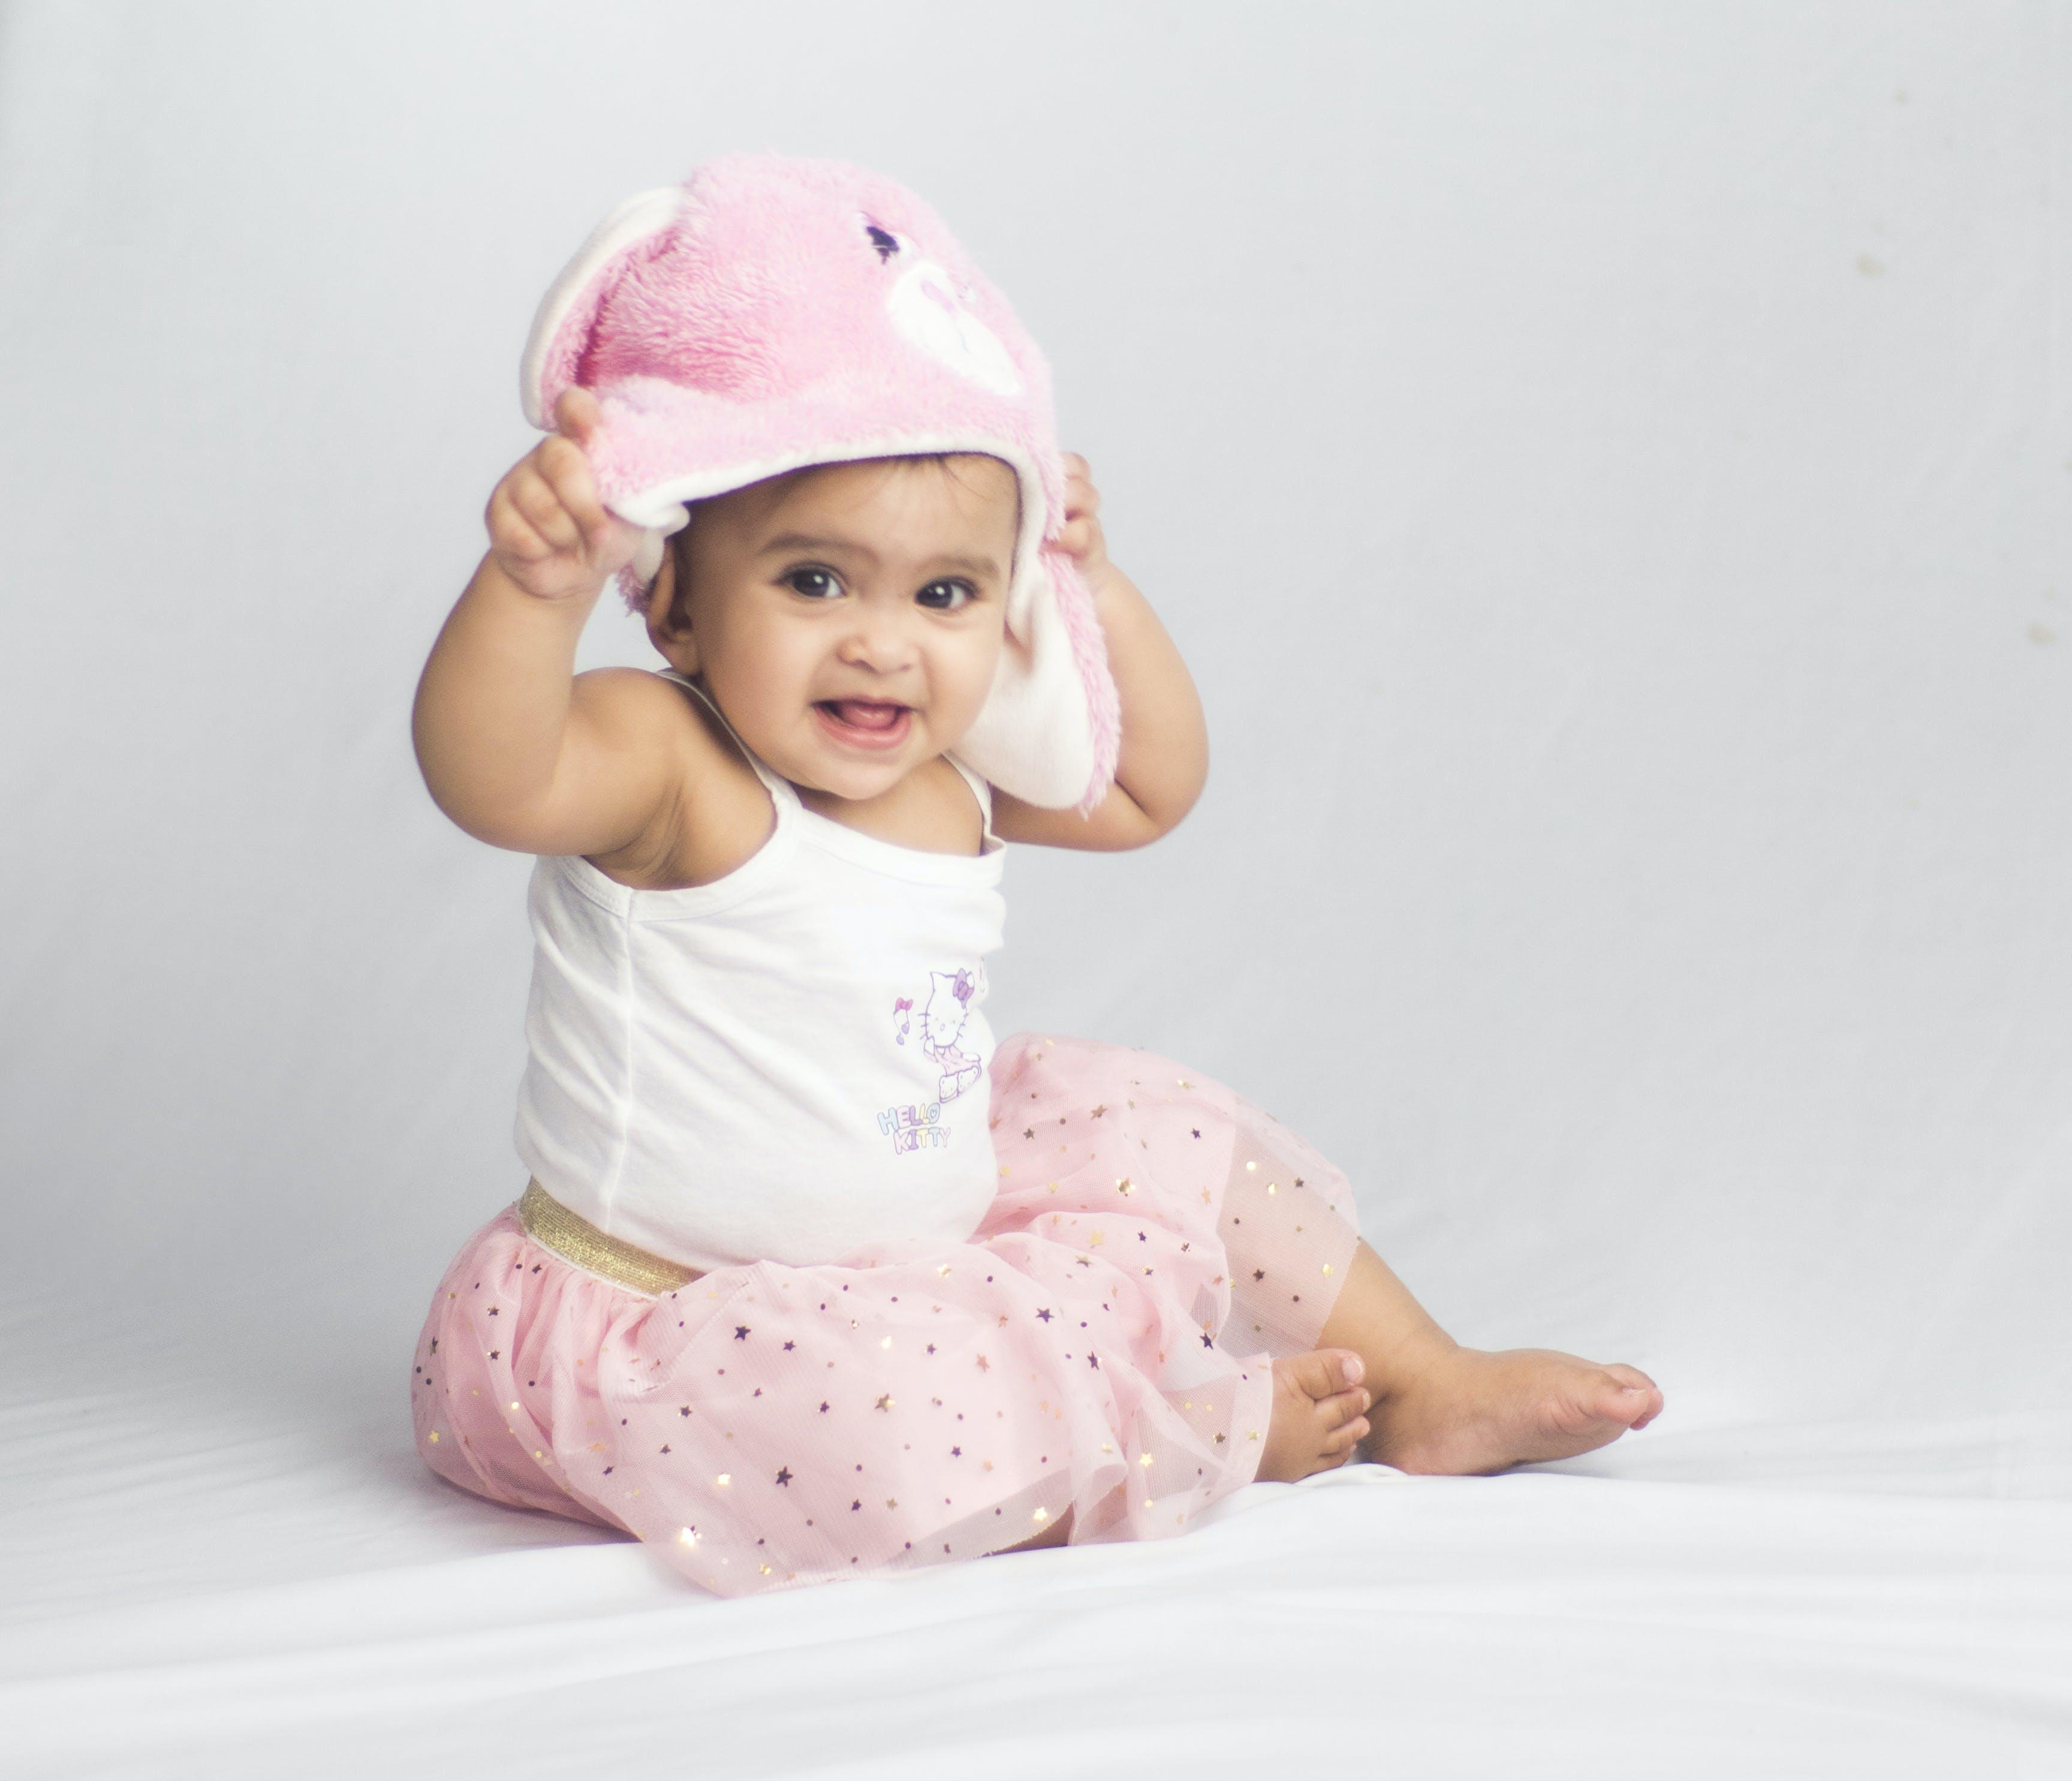 Free stock photo of babies, baby, baby girl, cute girl